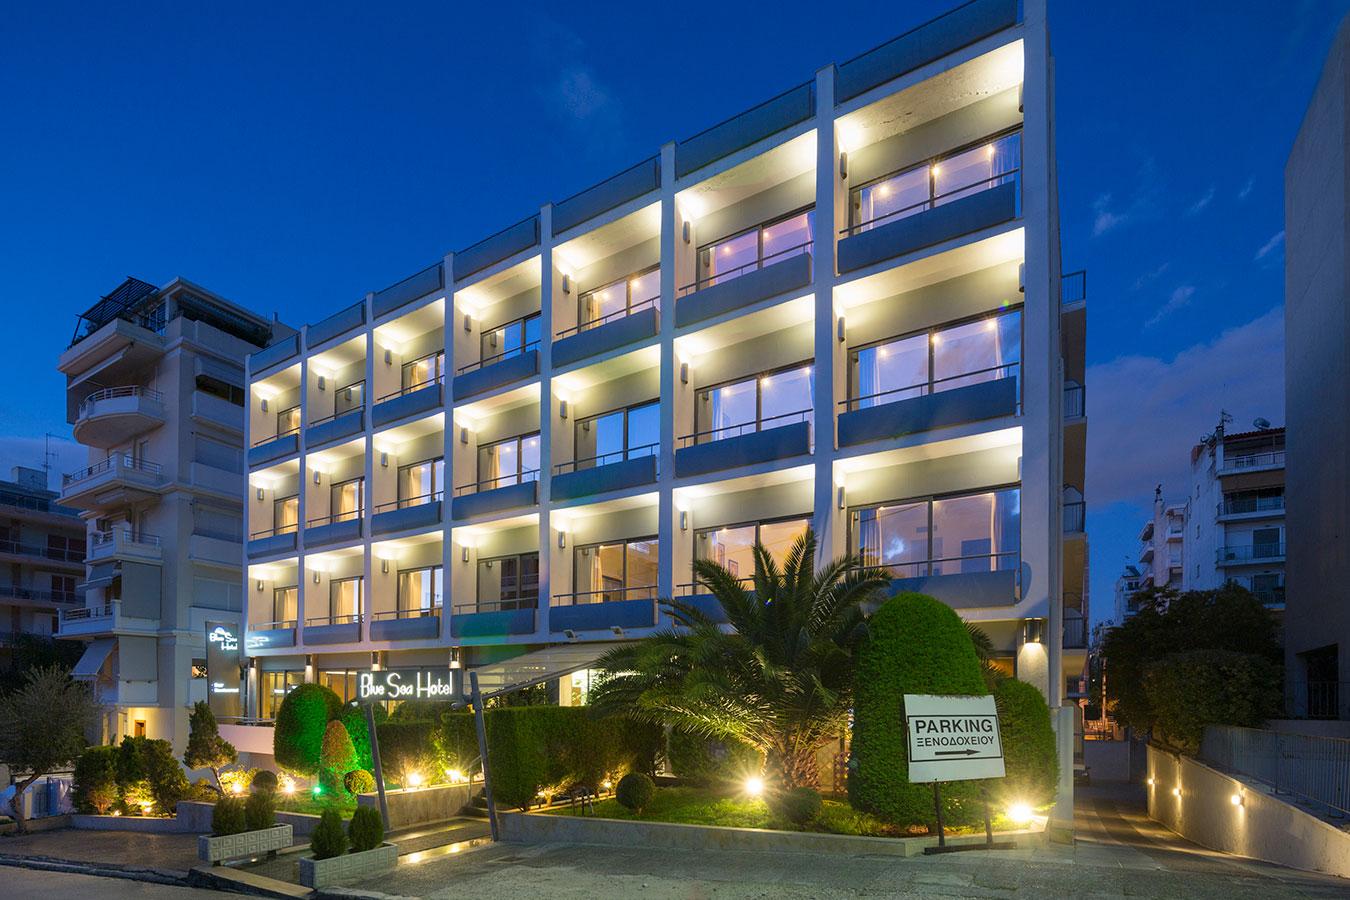 4* Blue Sea Hotel - Αθήνα ✦ 2 Ημέρες (1 Διανυκτέρευση) ✦ 2 άτομα ✦ Χωρίς Πρωινό ✦ 15/06/2020 έως 30/09/2020 ✦ Free WiFi